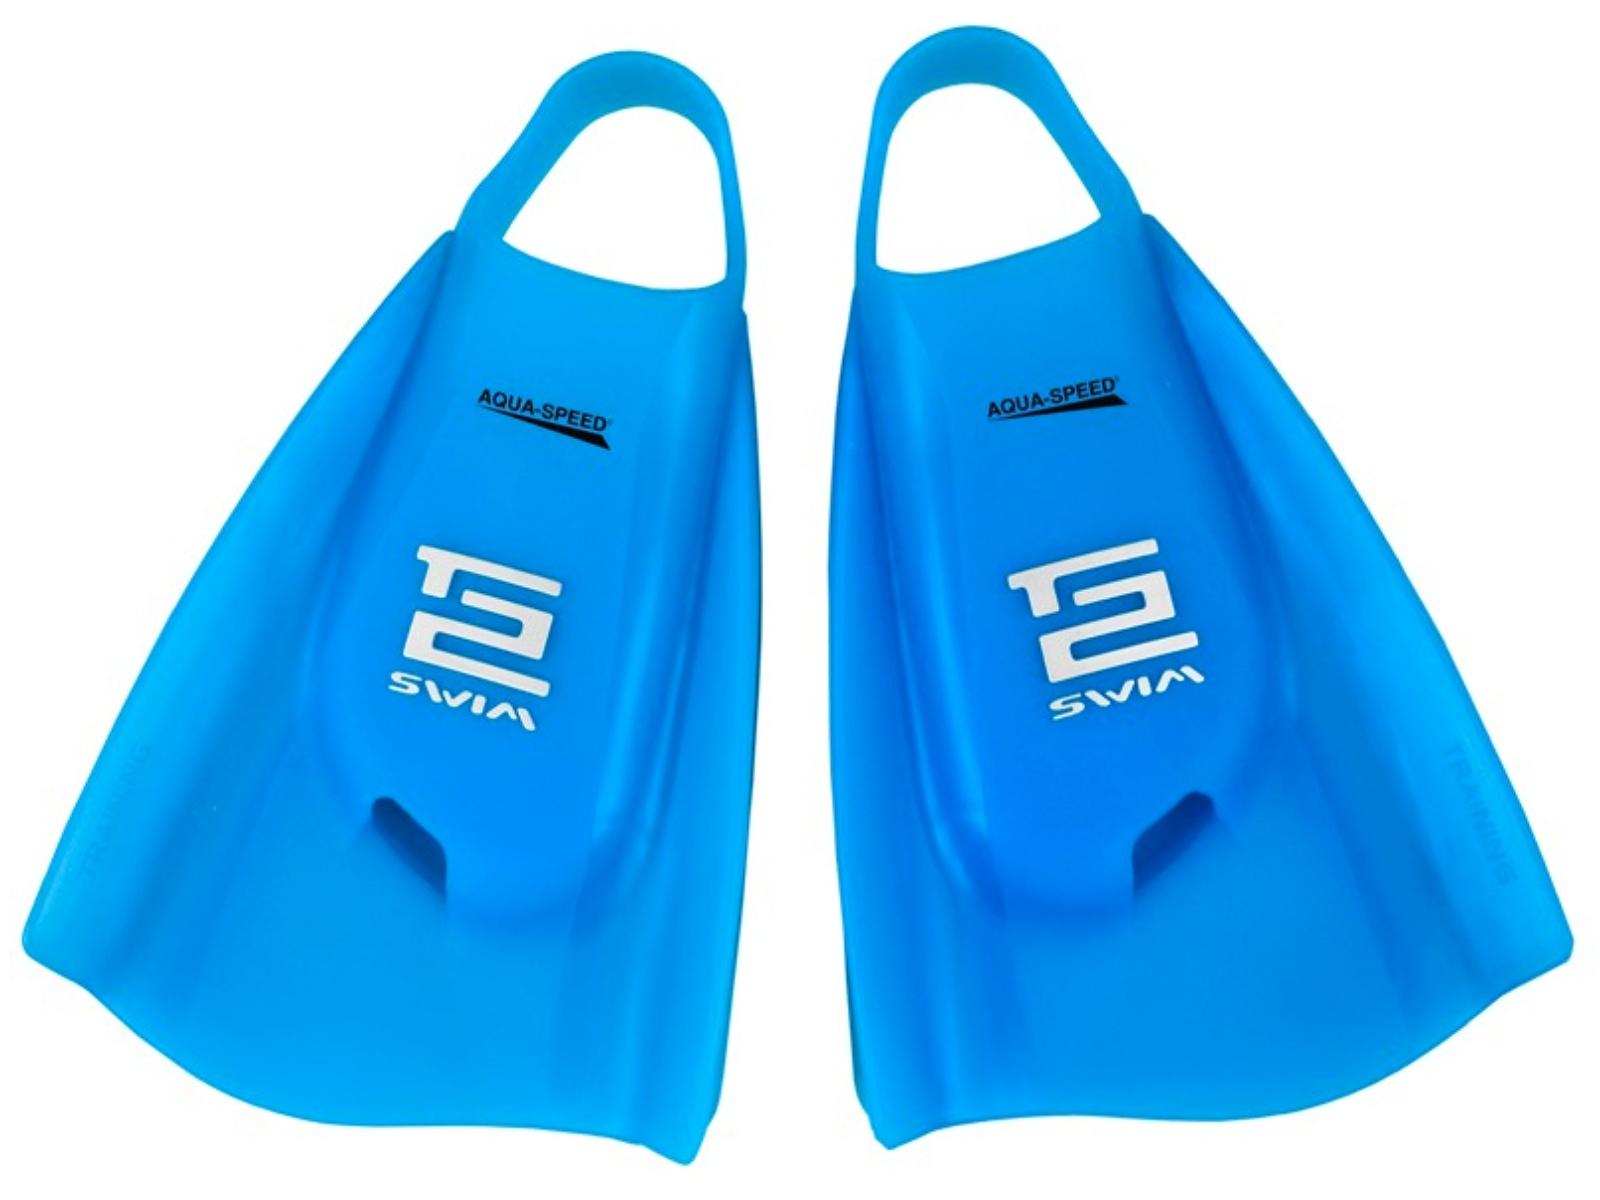 Aqua-Speed Tech2